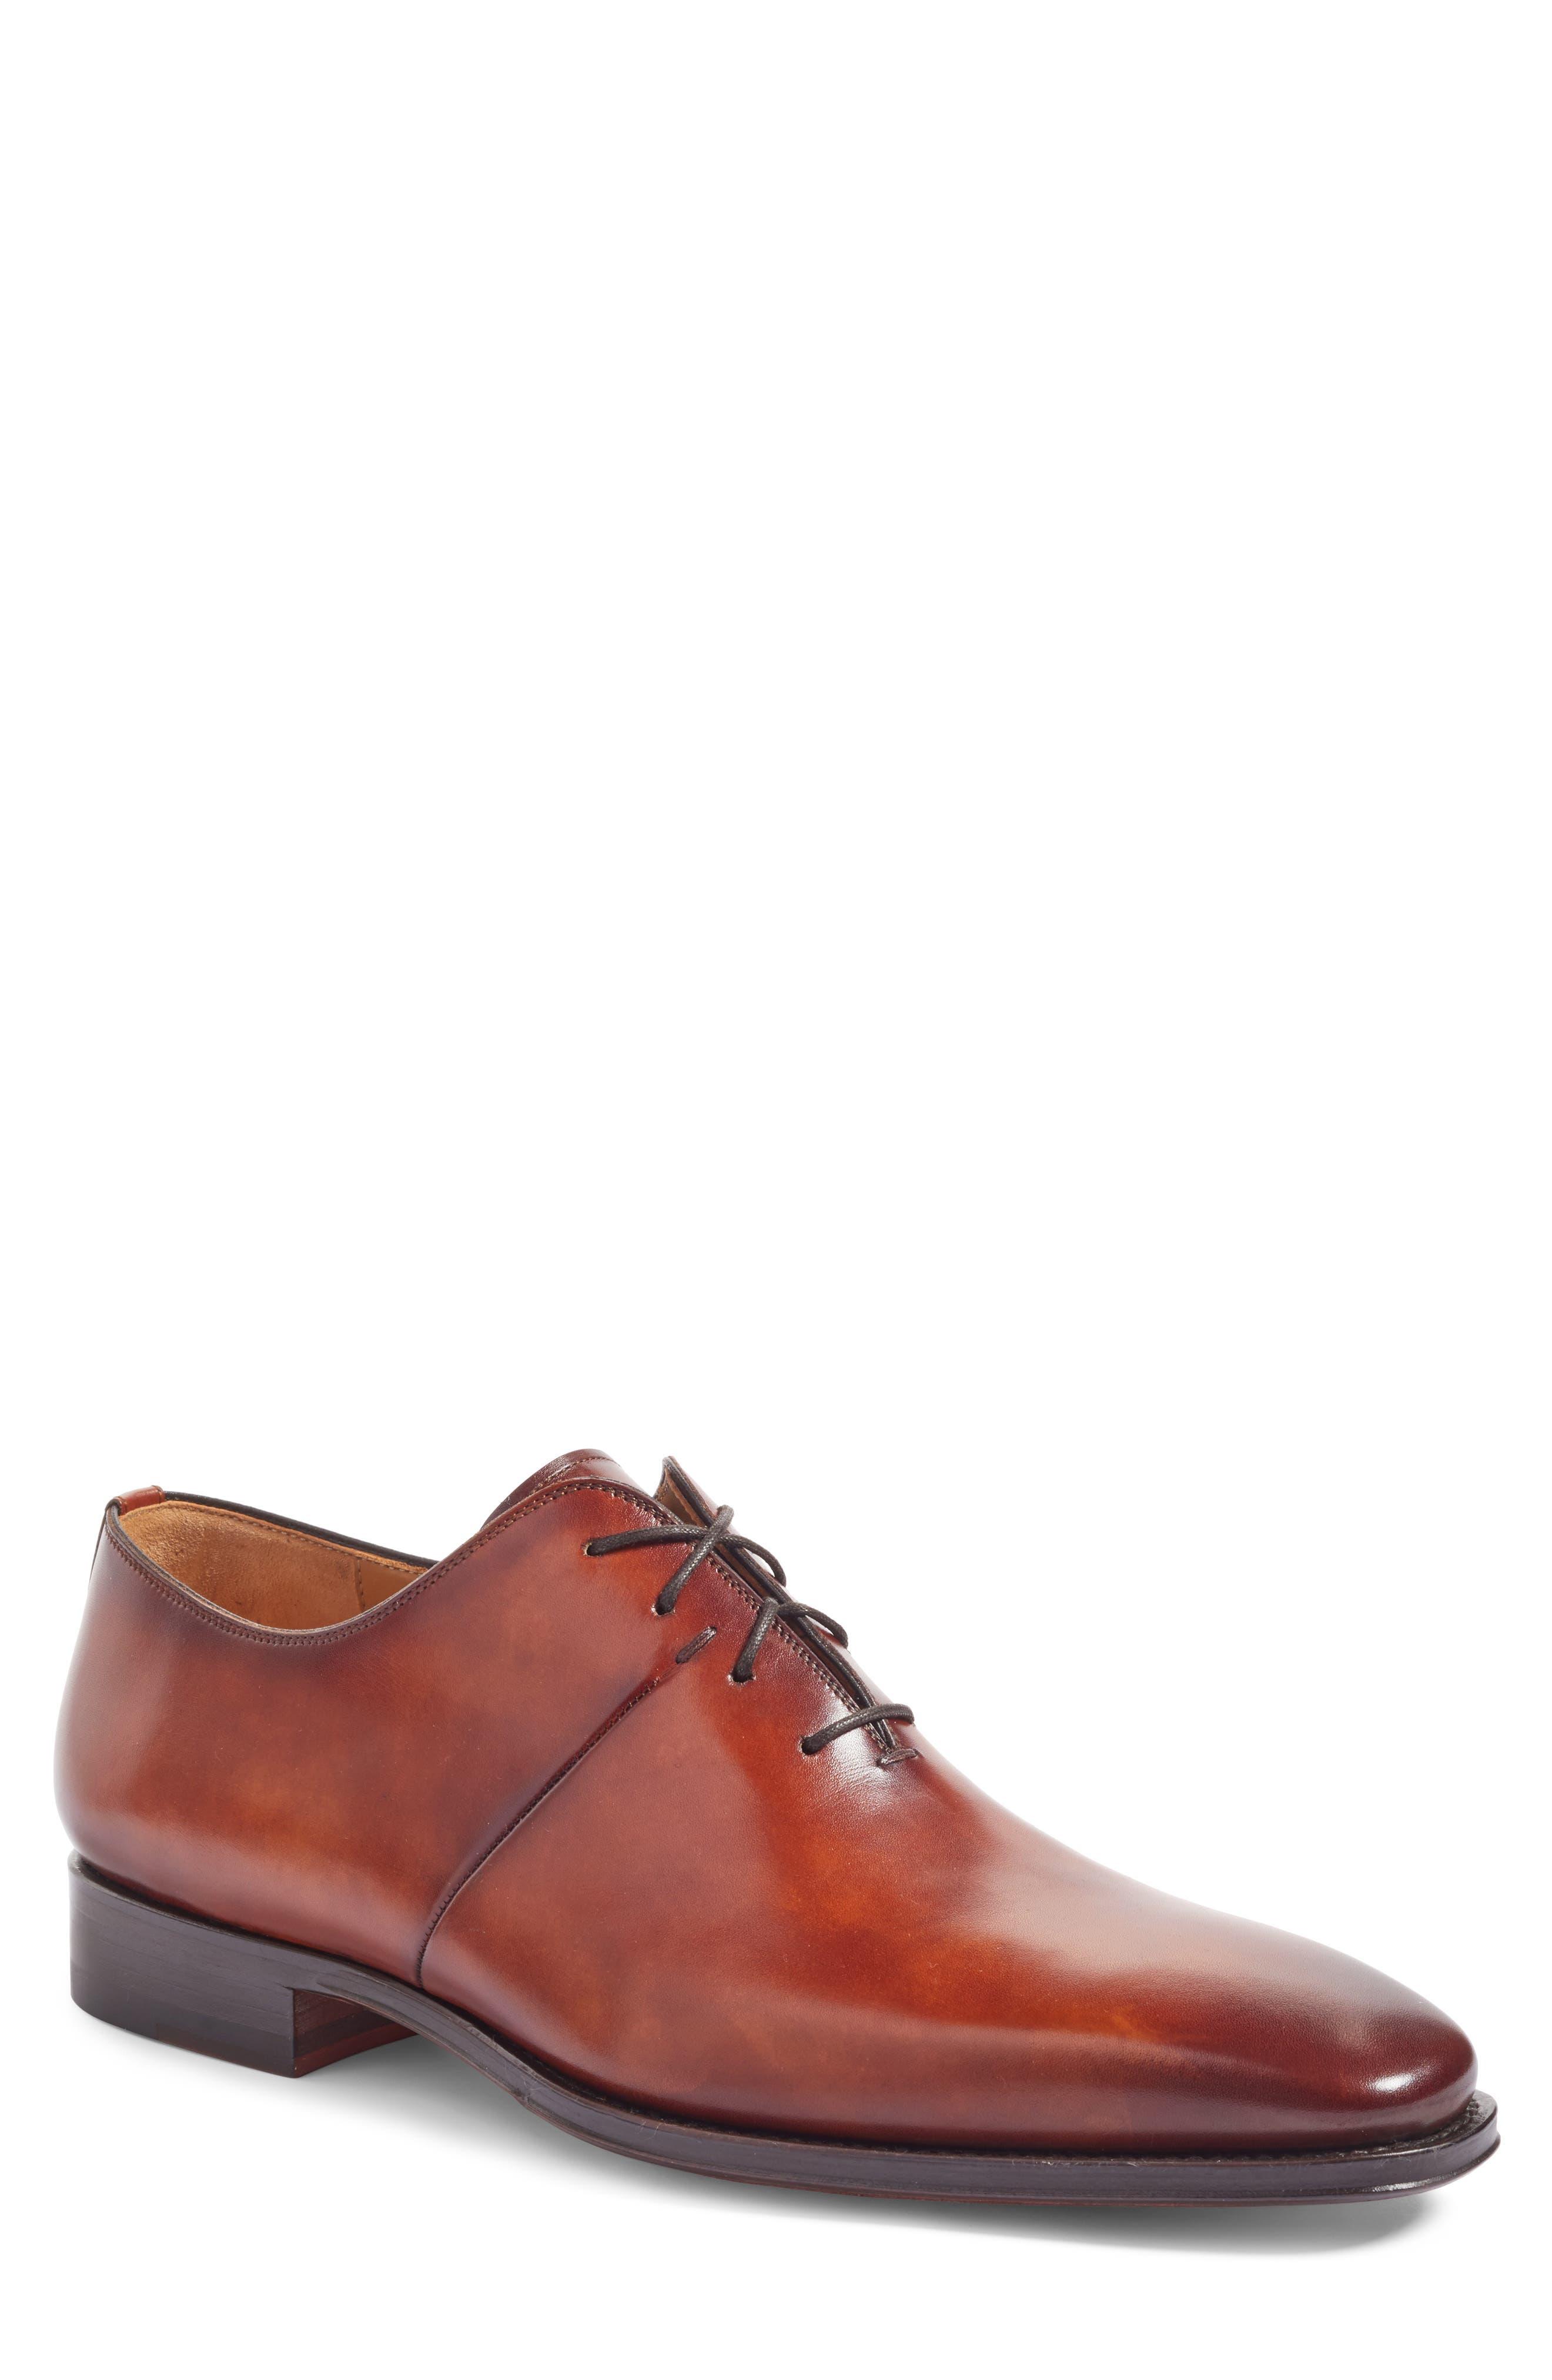 Cornado Plain Toe Oxford,                             Main thumbnail 1, color,                             Cognac Leather